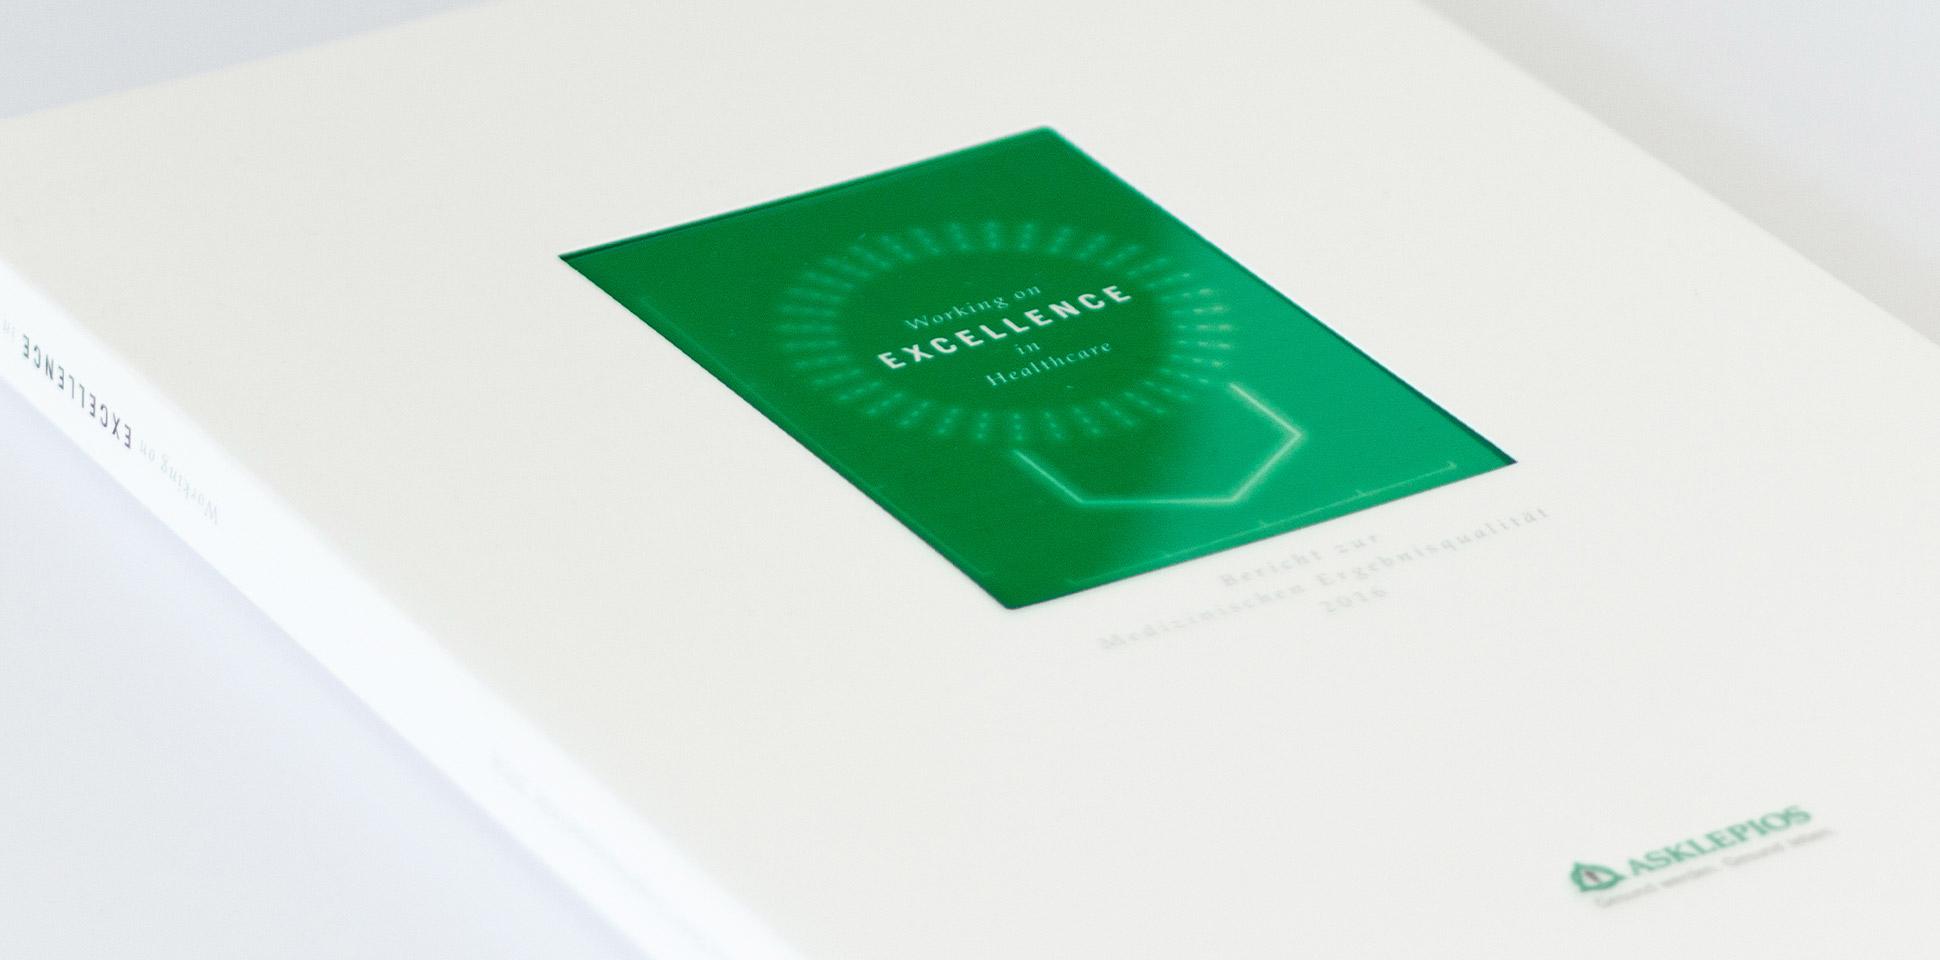 asklepios qualitaetsbericht cover 2016 polarwerk